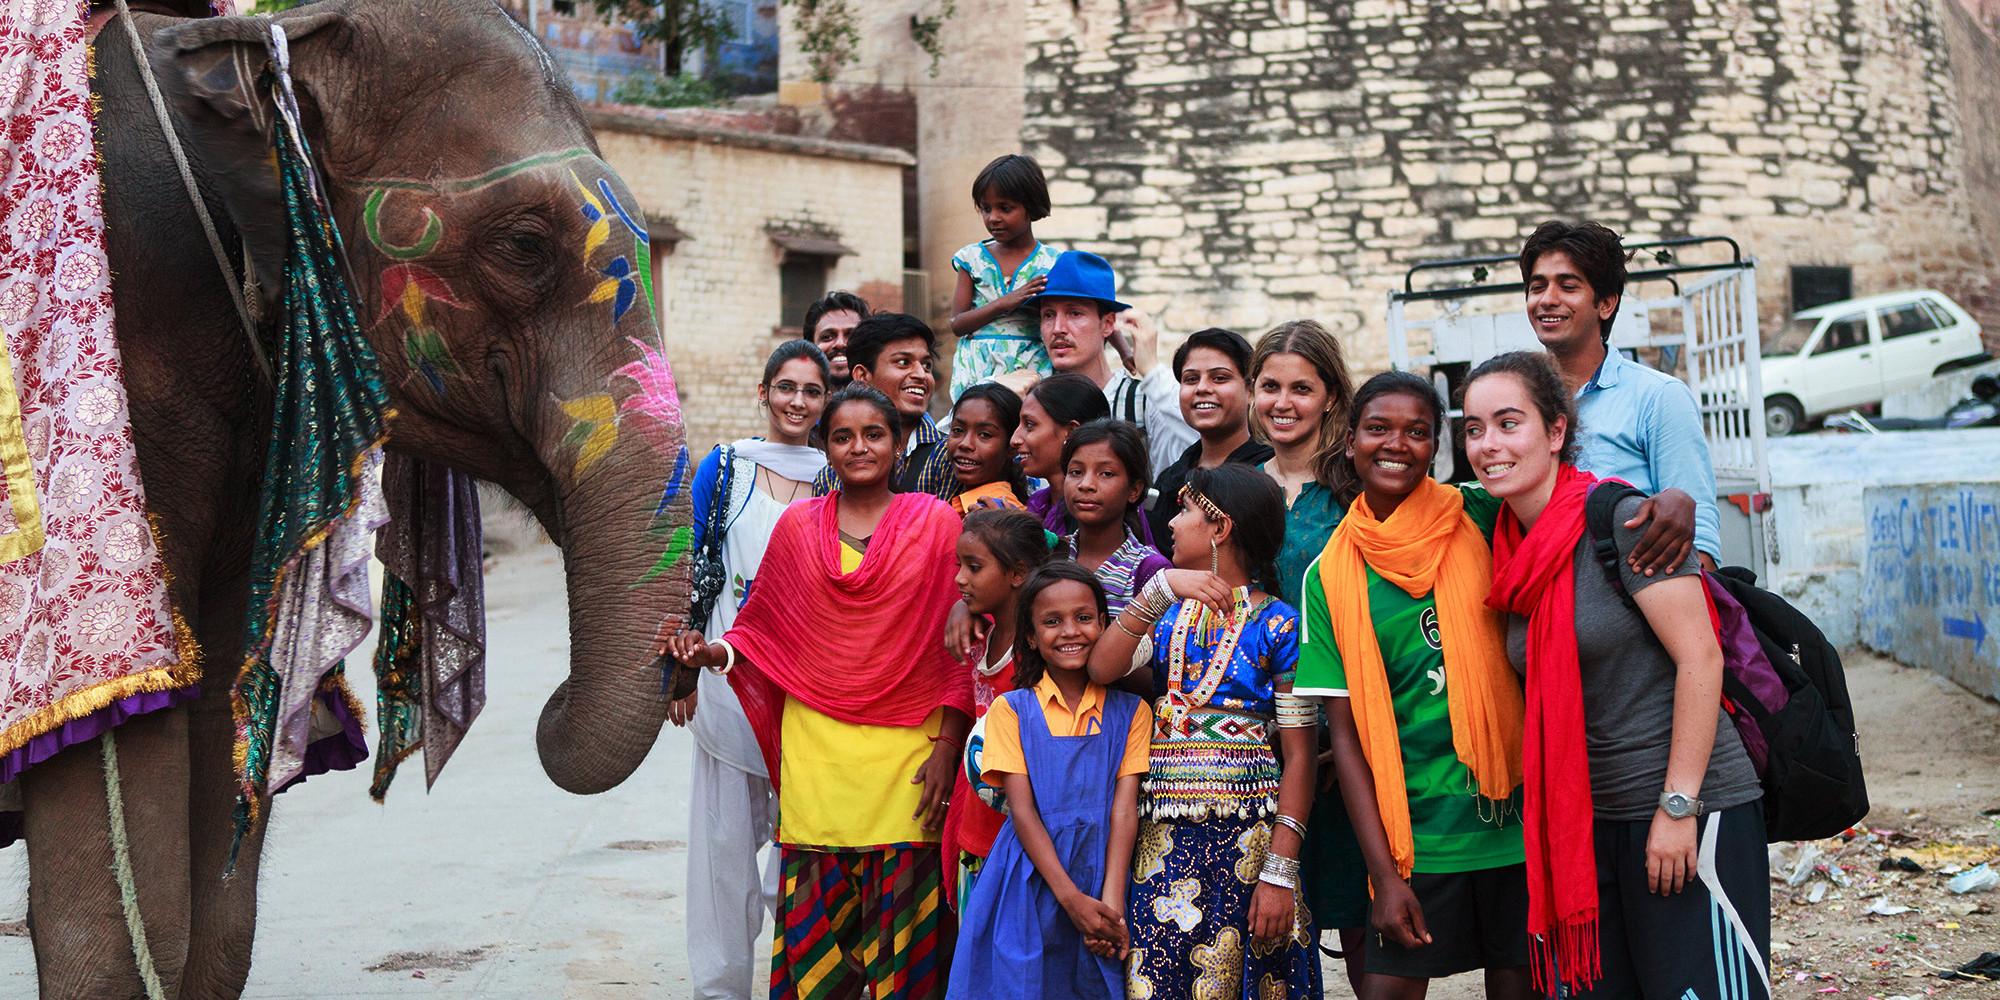 Kolkata-Born Photographer Uses Football To Empower Girls In India